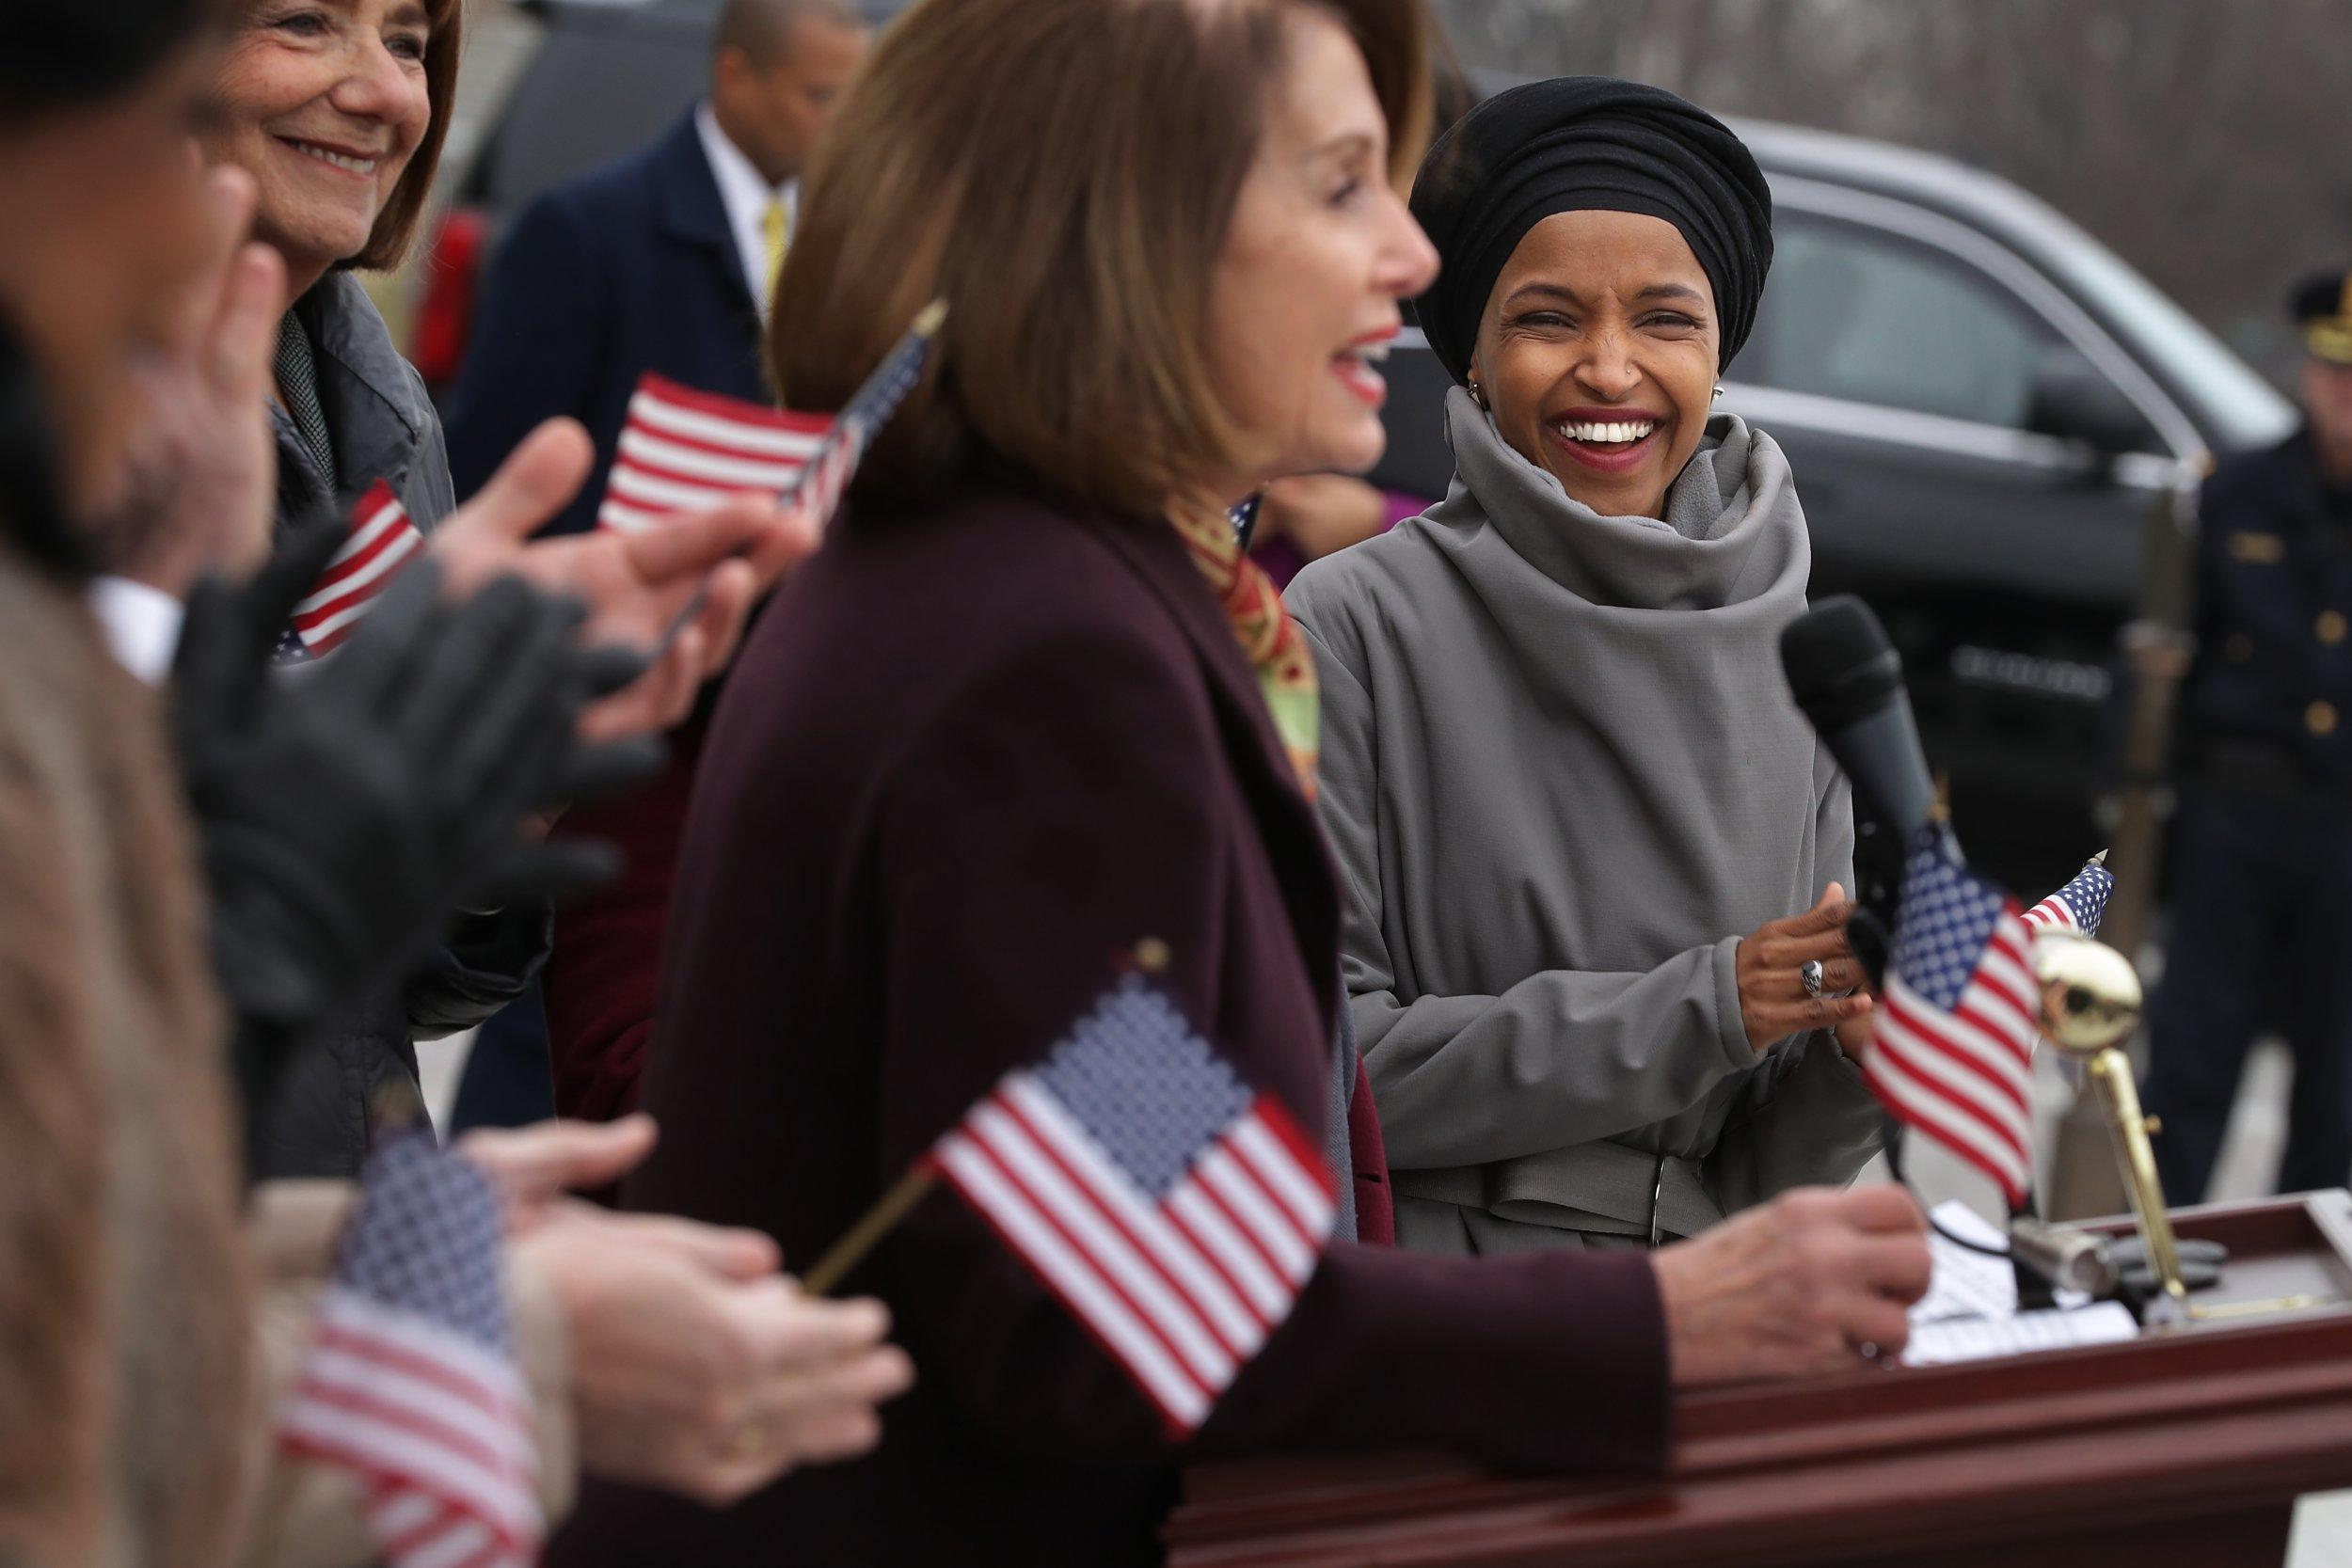 Nancy Pelosi, defends, Ilhan Omar, criticizes Trump